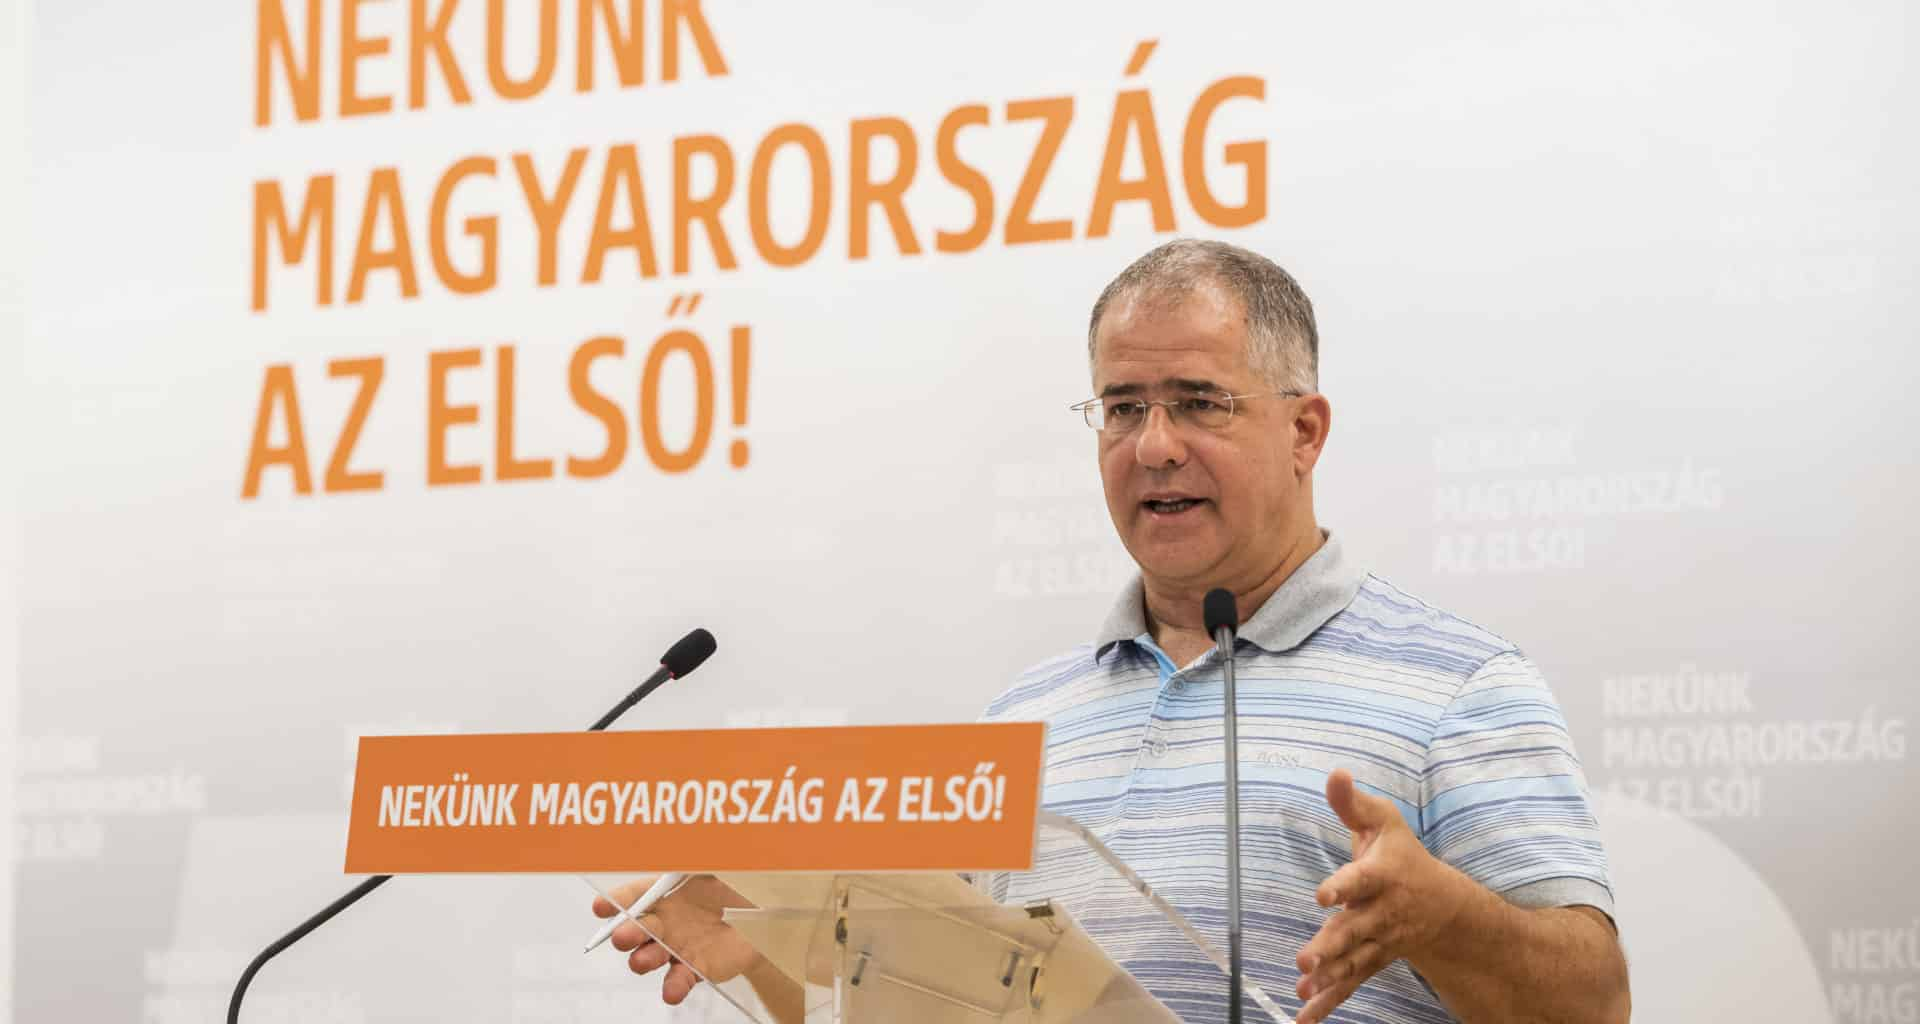 fidesz campaign Kósa